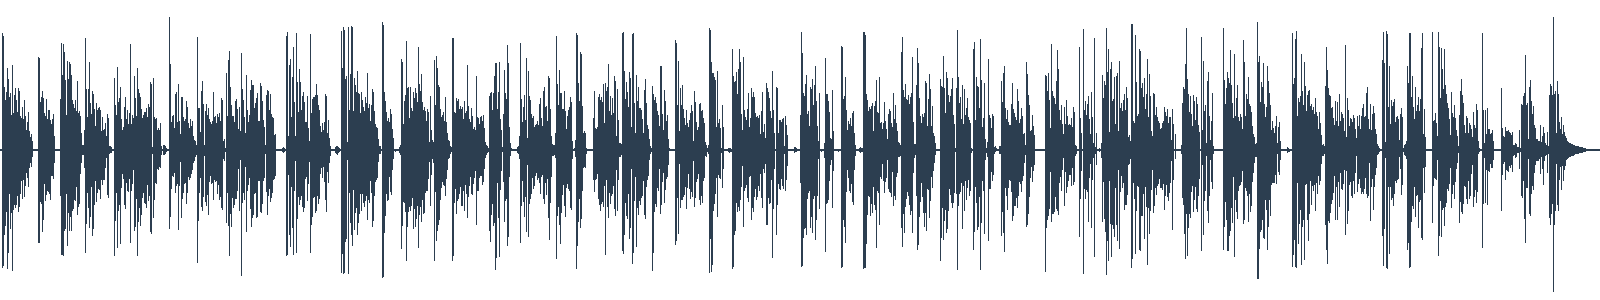 Paní Láryfáry - ukázka z audioknihy waveform